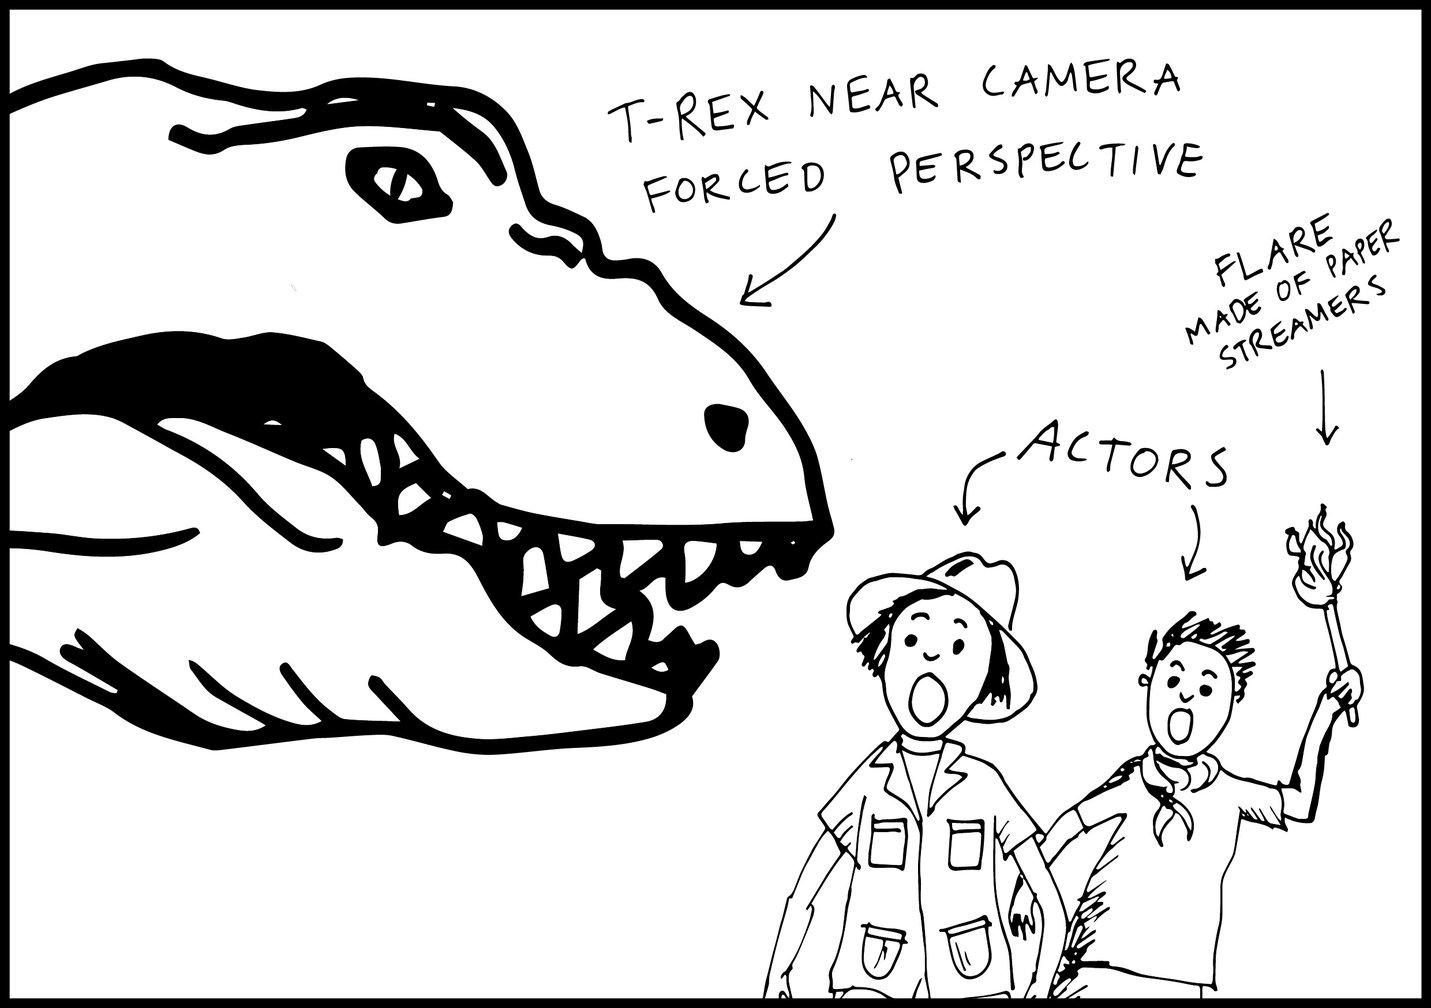 Storyboard for sweding 2